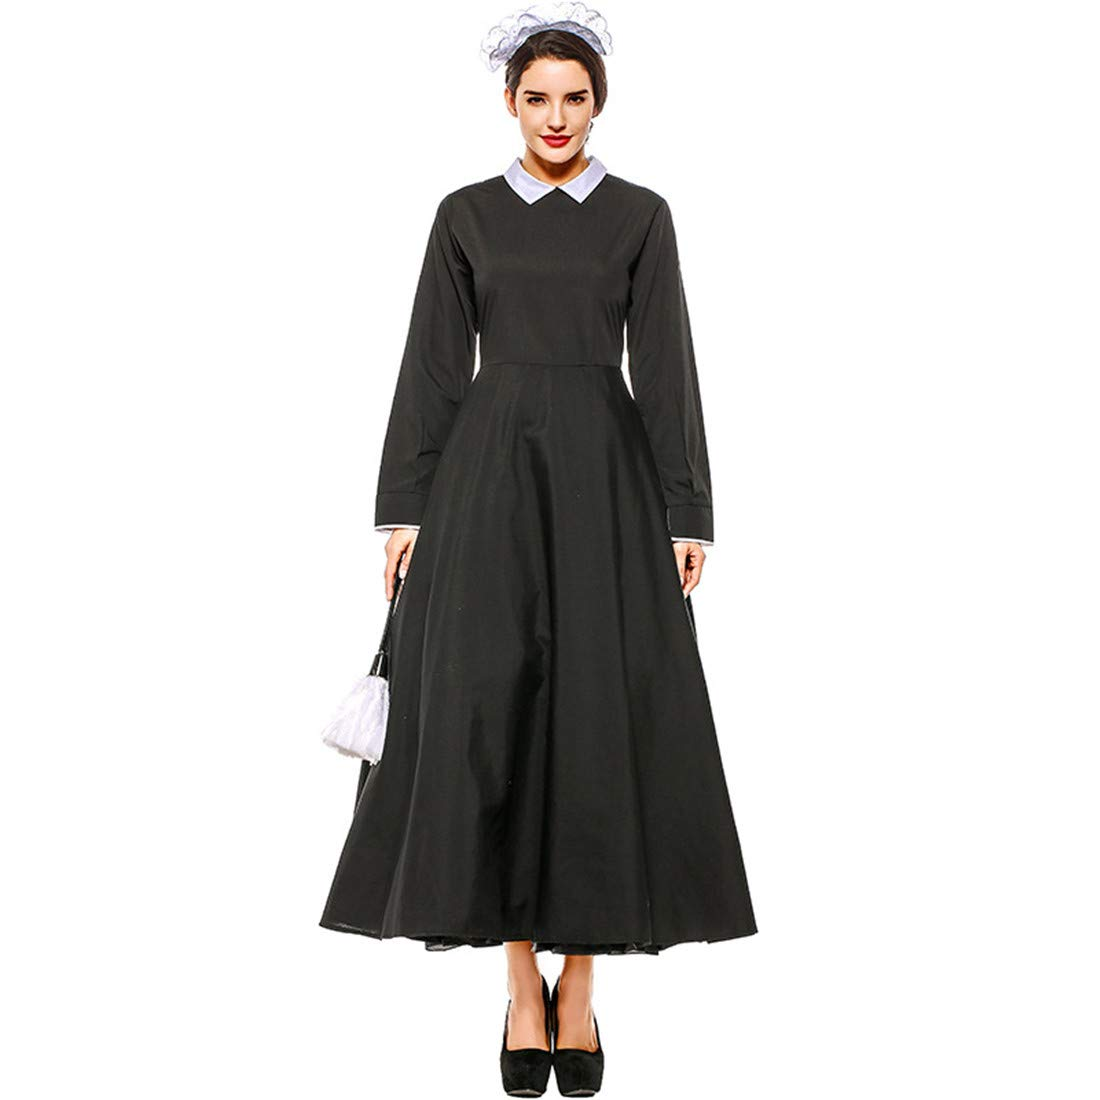 Amazon.com: LY-VV - Vestido de peregrino para mujer, talla ...